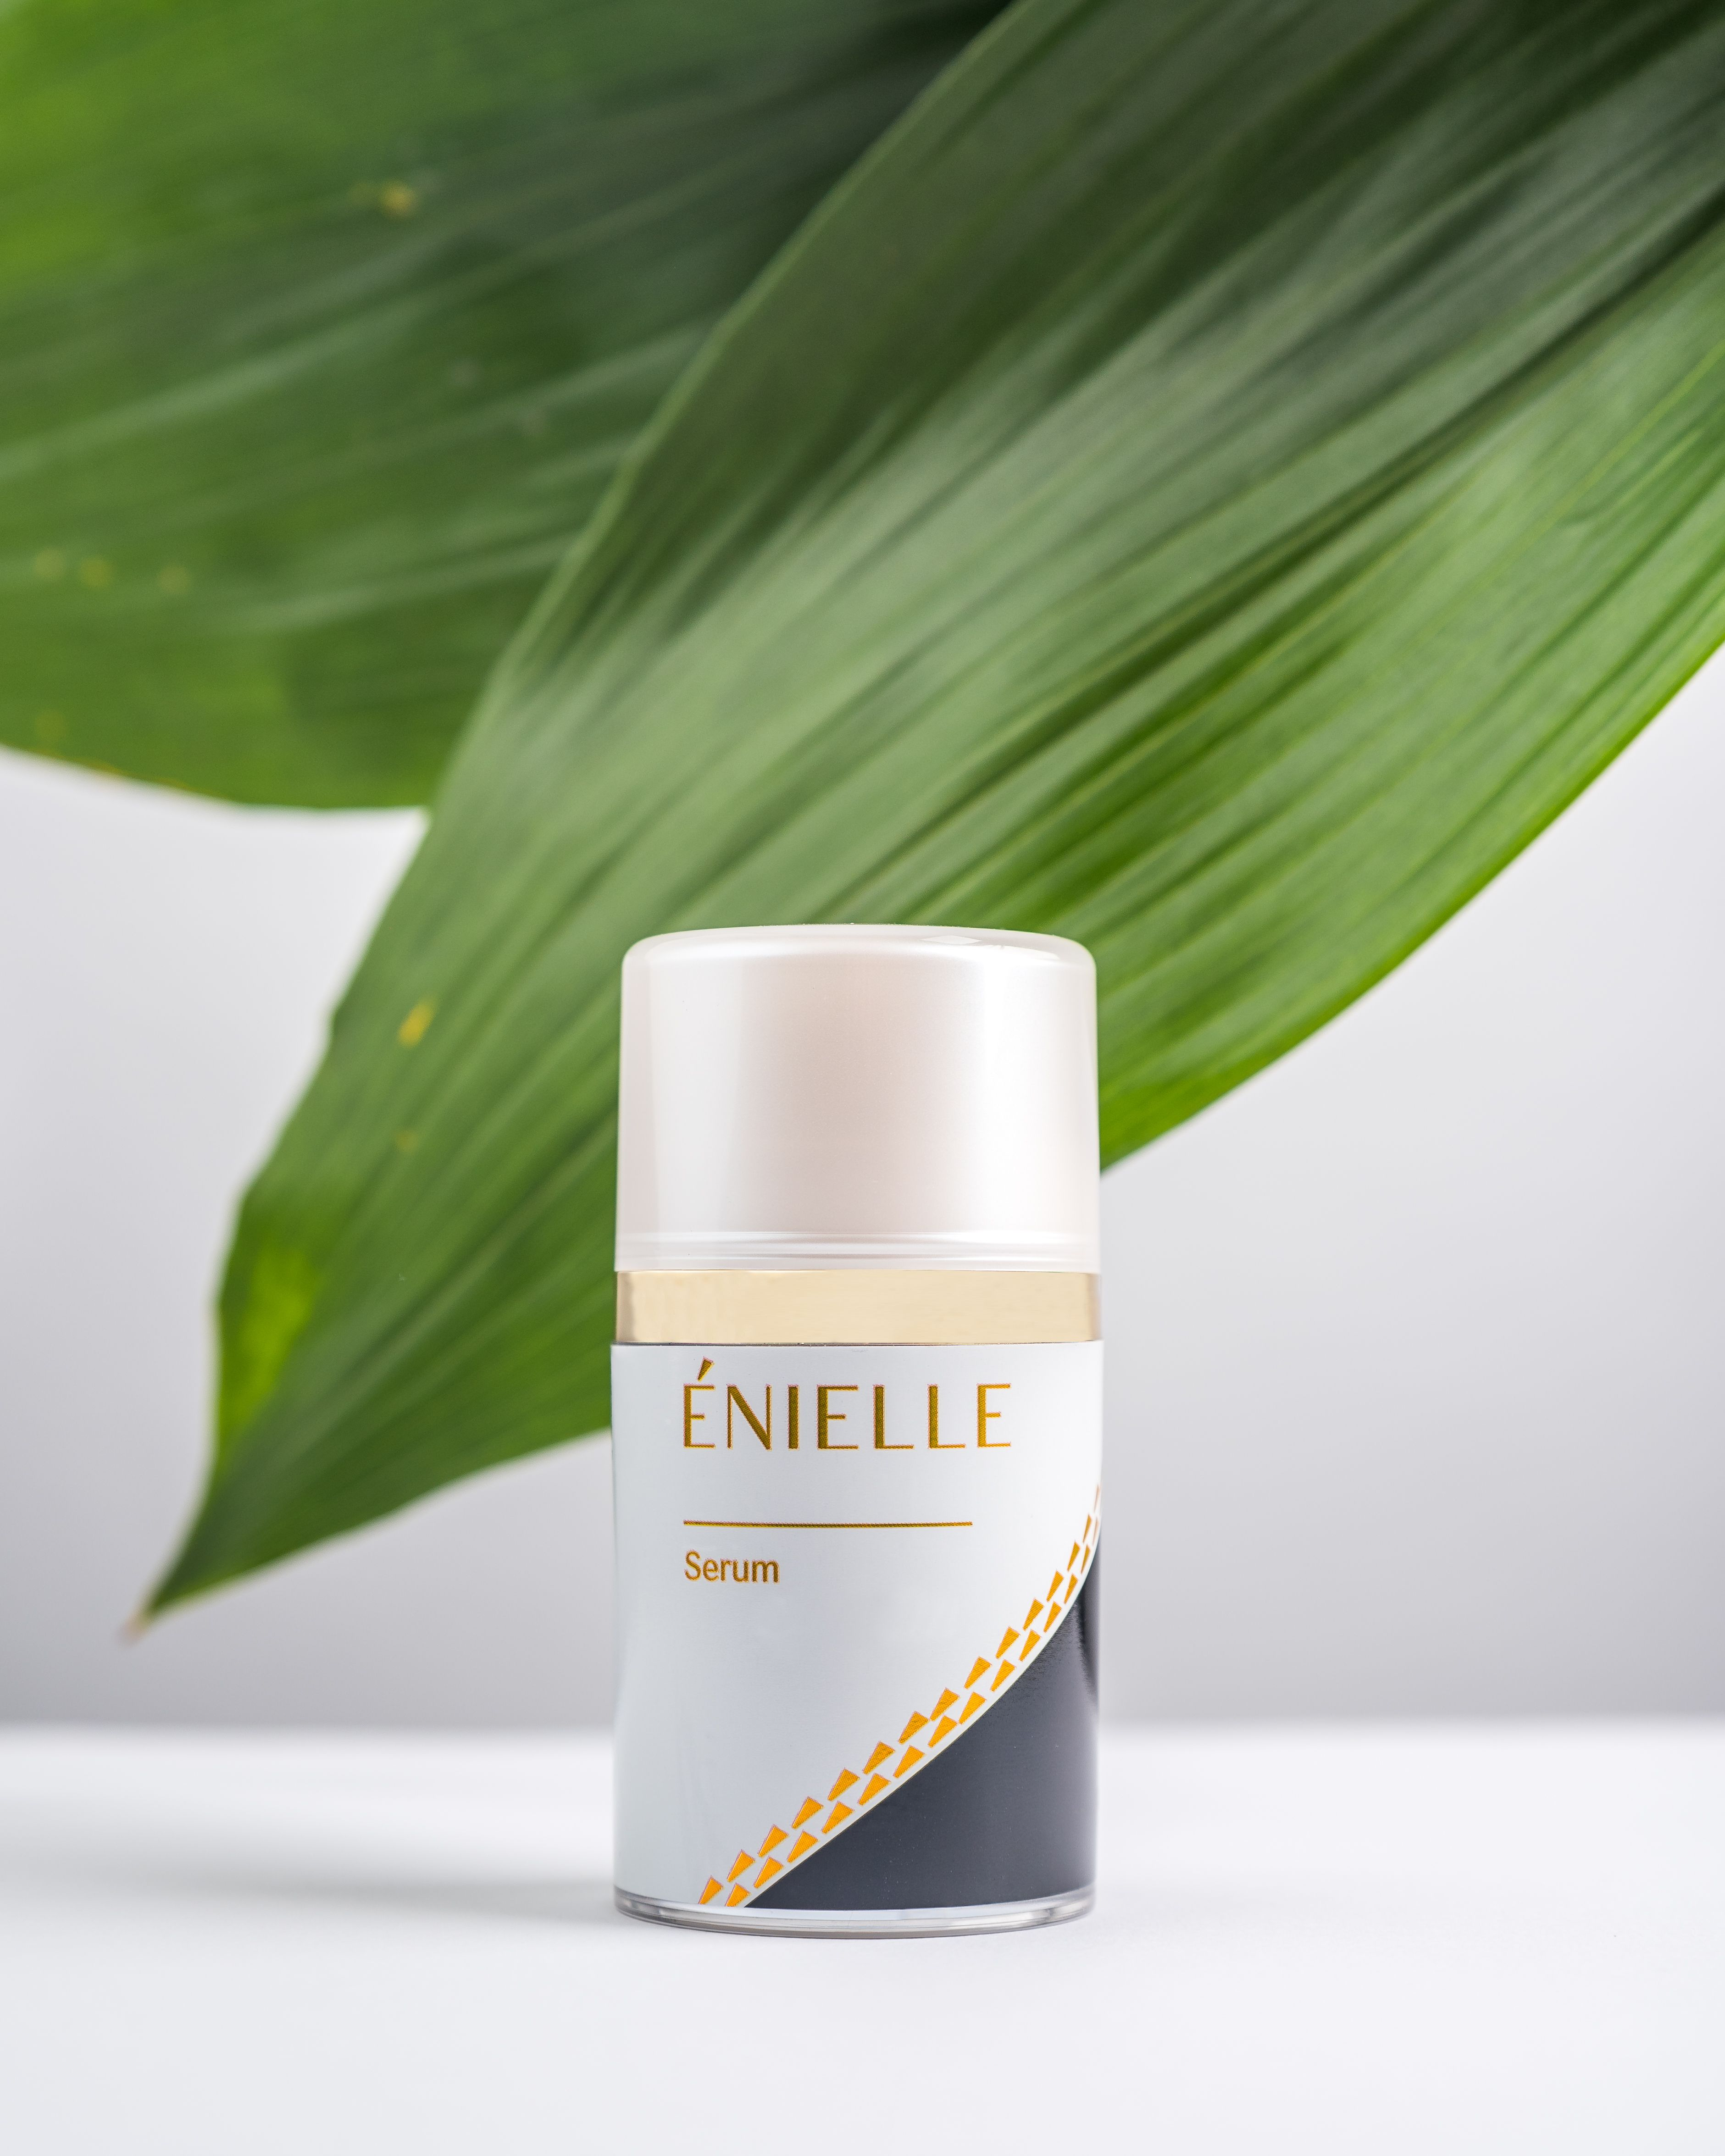 Pin von Énielle Skincare auf Énielle Hautbehandlungen